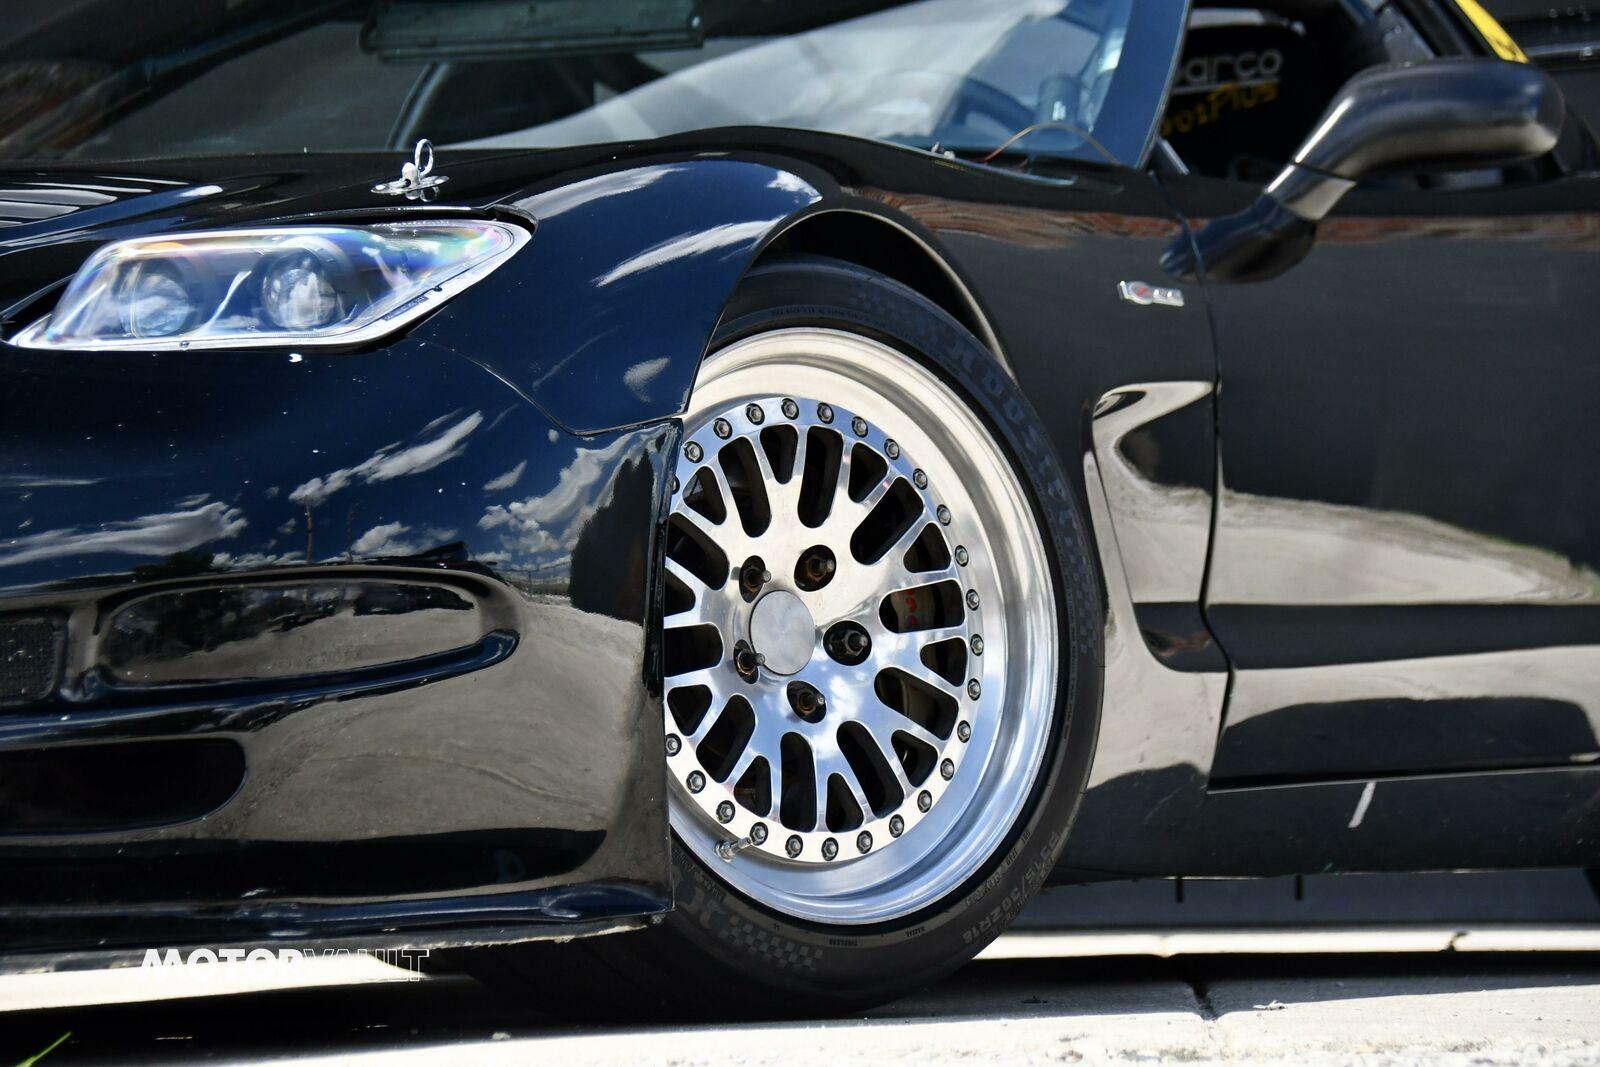 1999 Black Chevrolet Corvette   | C5 Corvette Photo 5